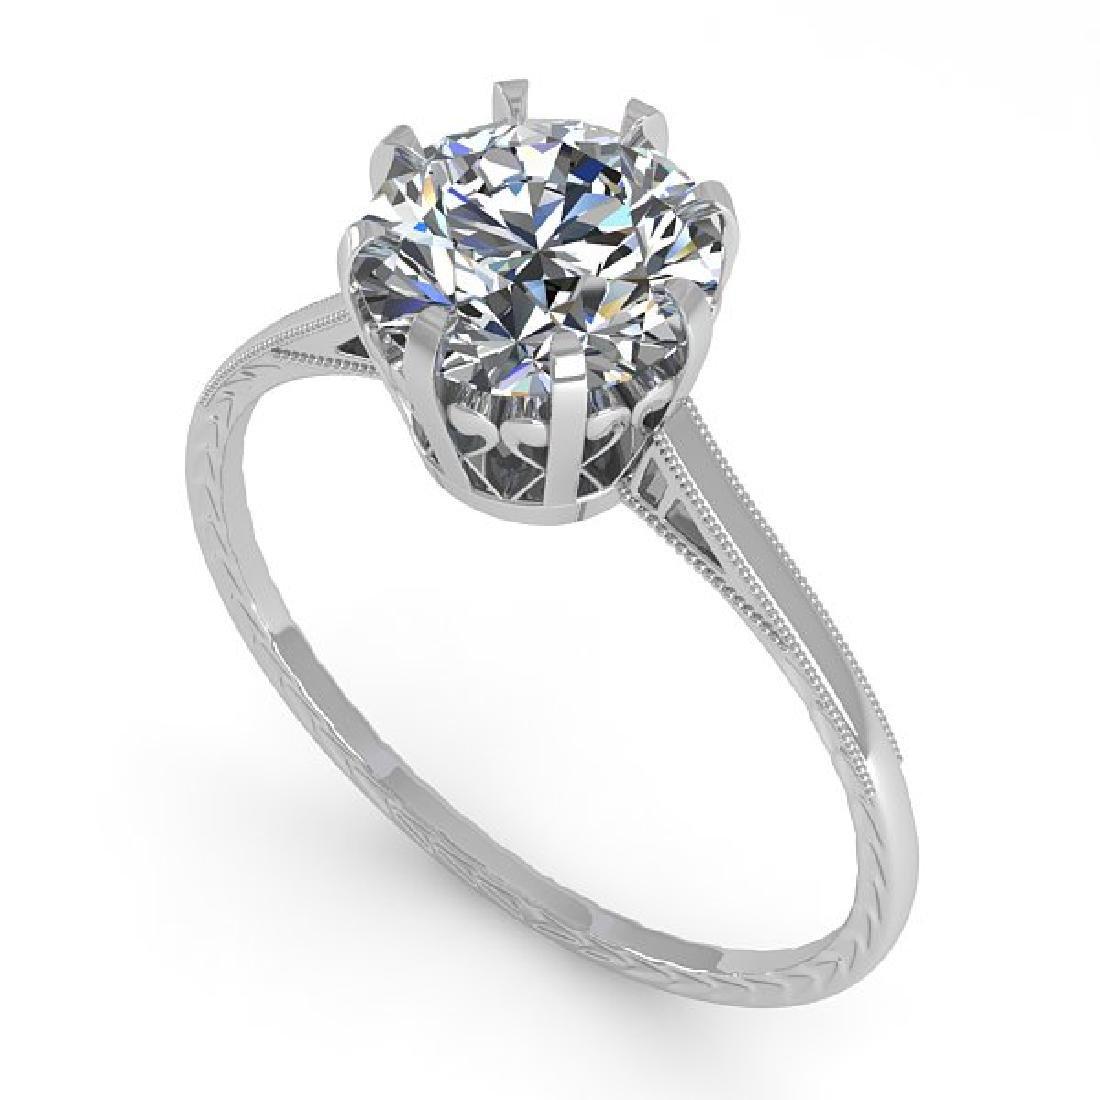 1.51 CTW Certified VS/SI Diamond Ring 14K White Gold - 2